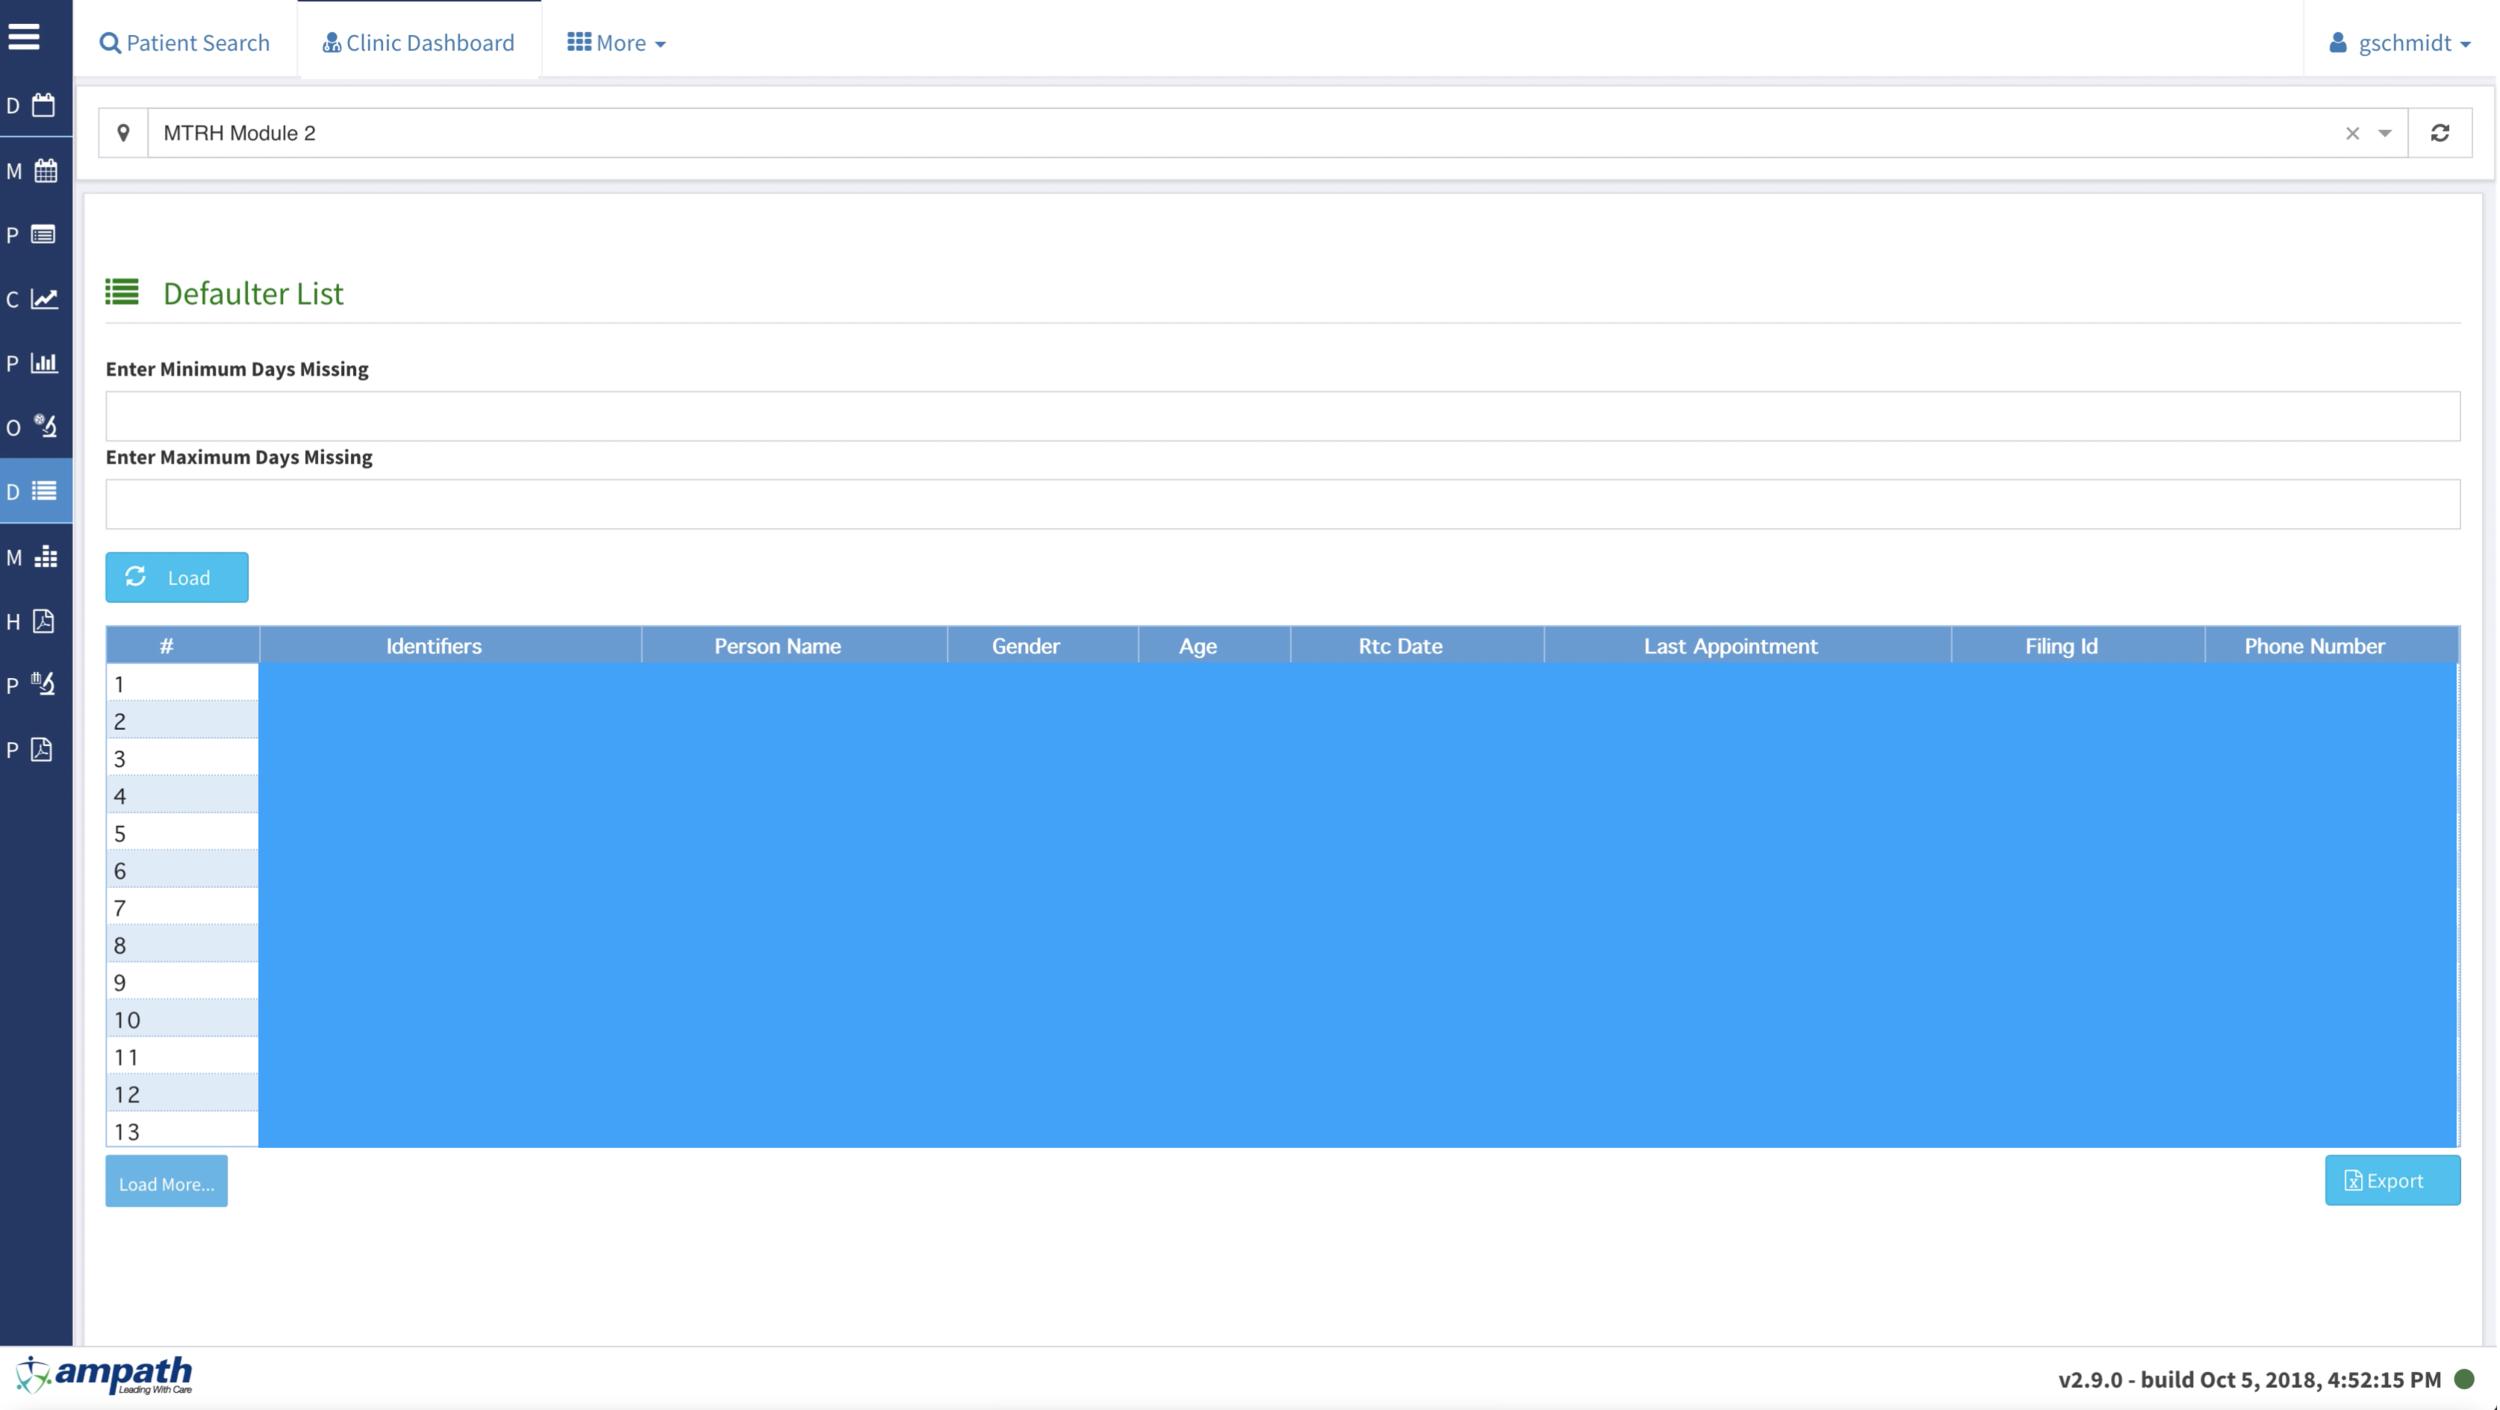 Screenshot 2018-10-18 19.36.09.png